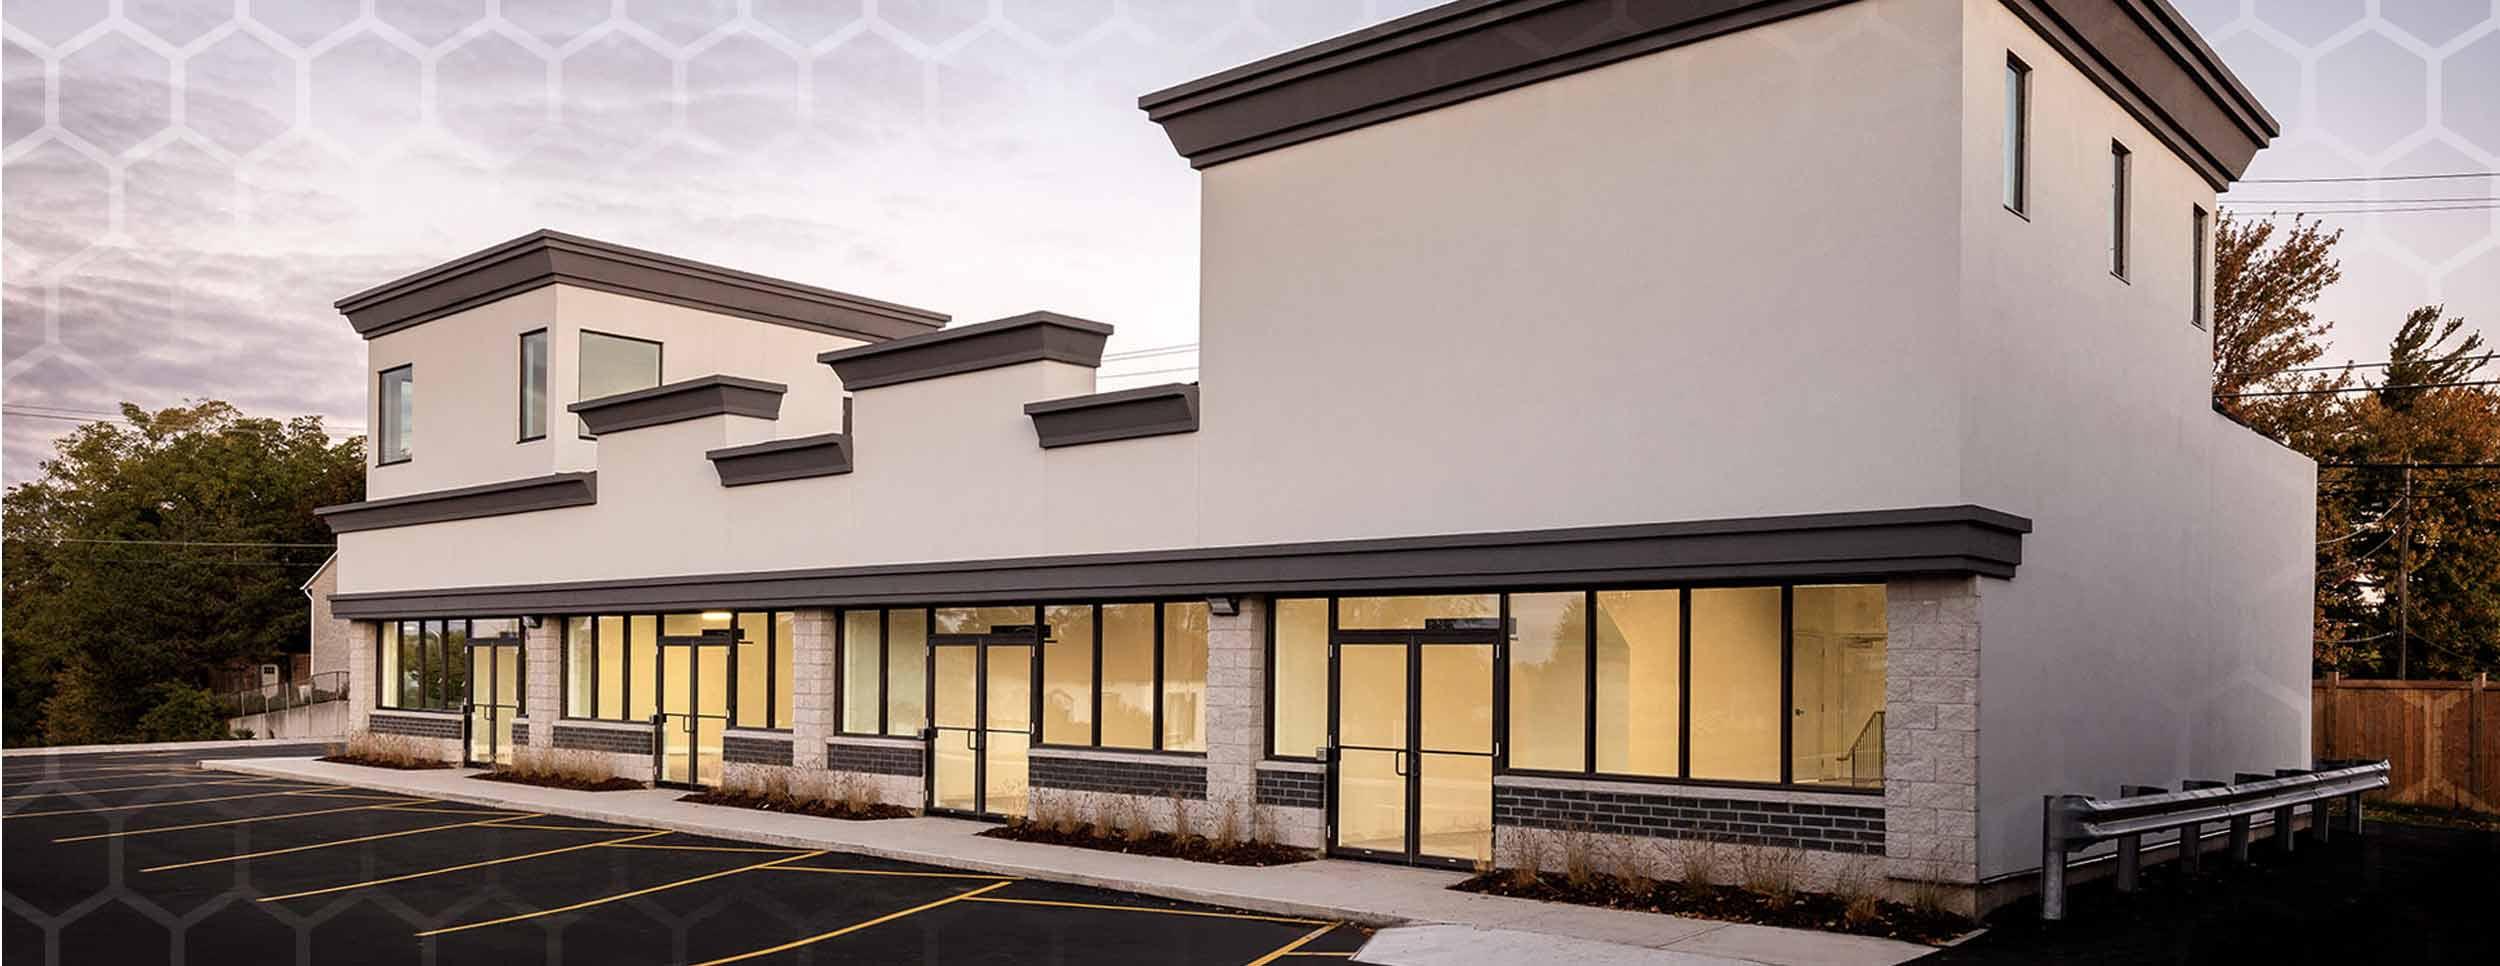 801 Dundas Street Woodstock Retail office building that has light beige walls and dark brown trim. Glass windows all across the first floor.